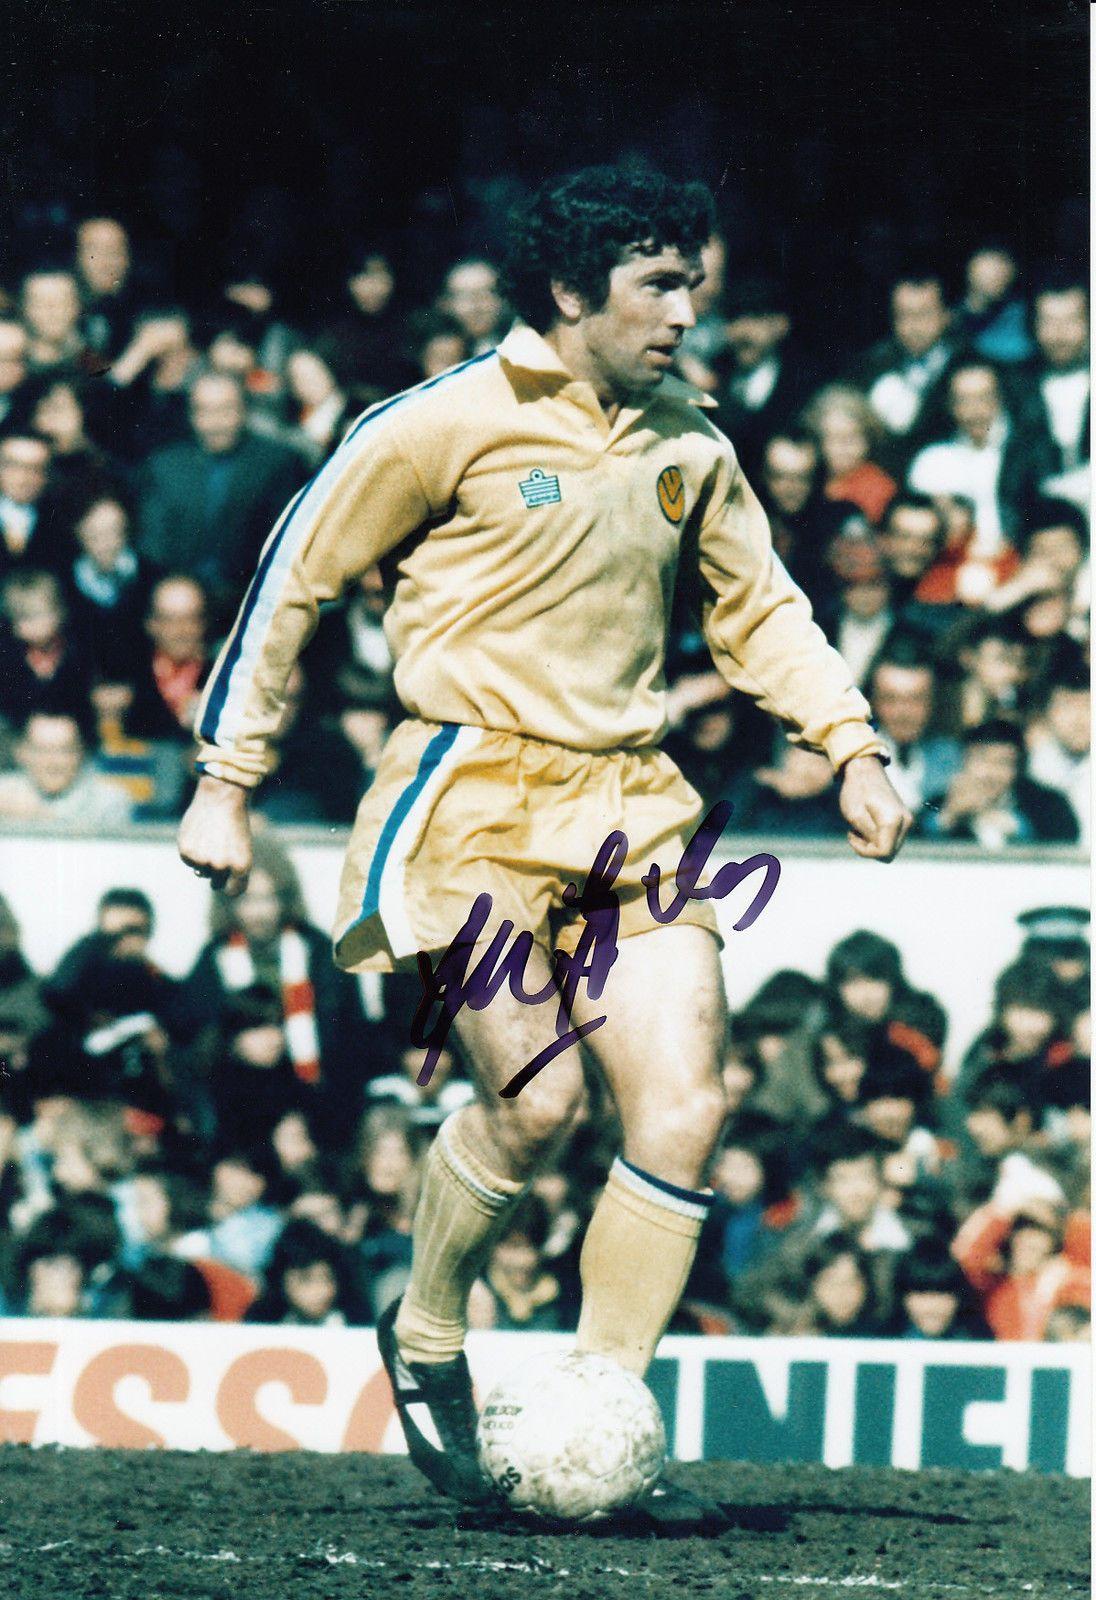 Johnny Giles of Leeds Utd in 1974. Leeds united, Sports